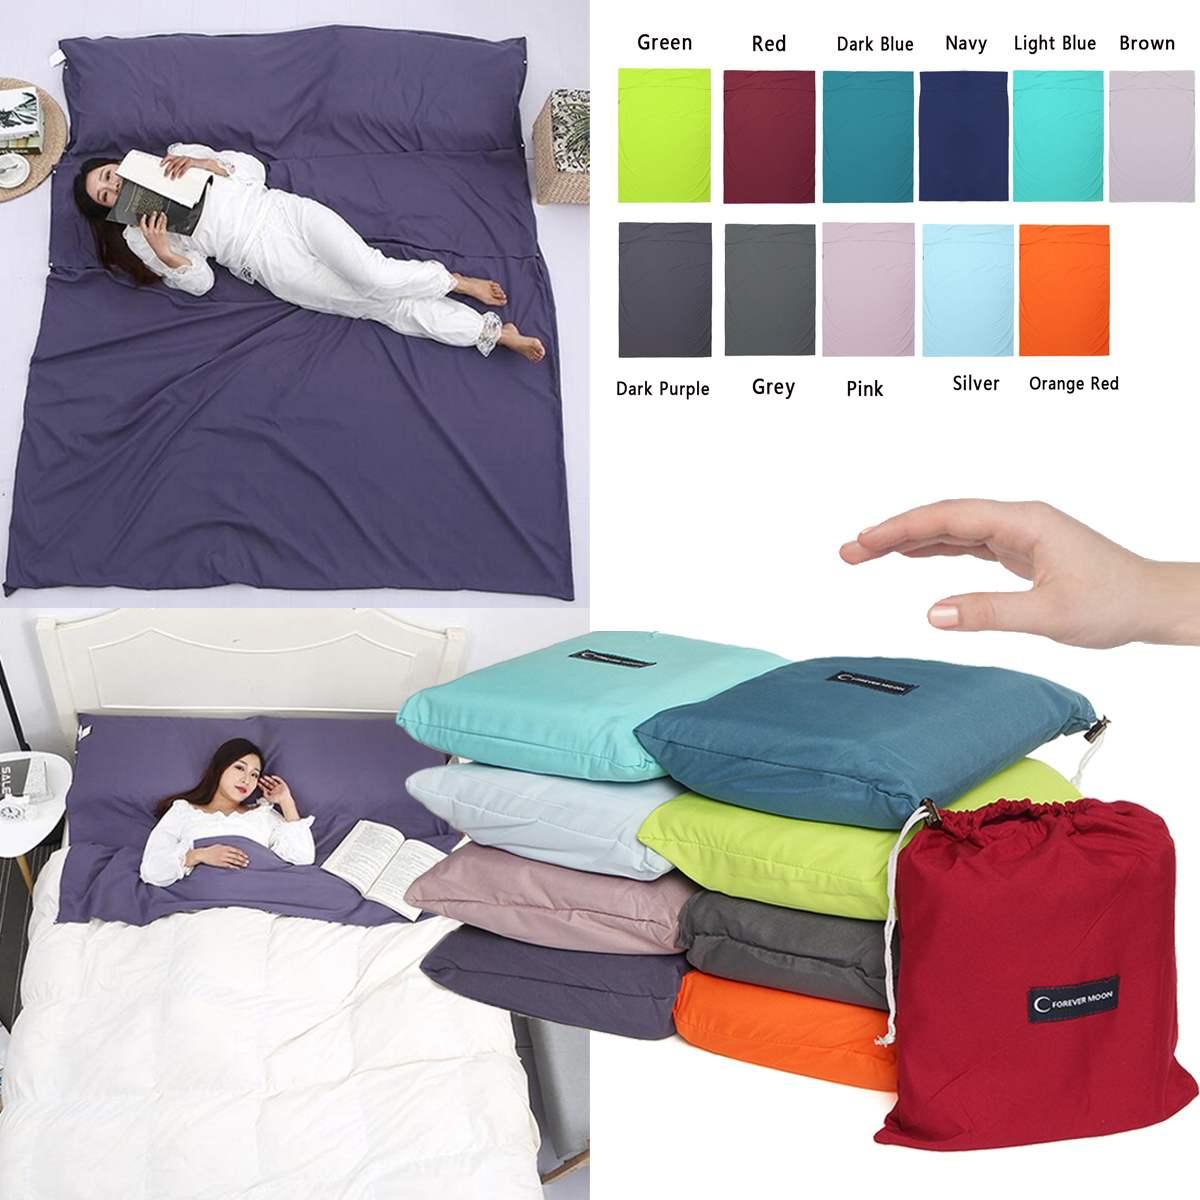 Bolsa de dormir portátil para viaje al aire libre, plegable, ultraligera, aislada, sucia, Sábana de sábana de acampada, 160x210cm